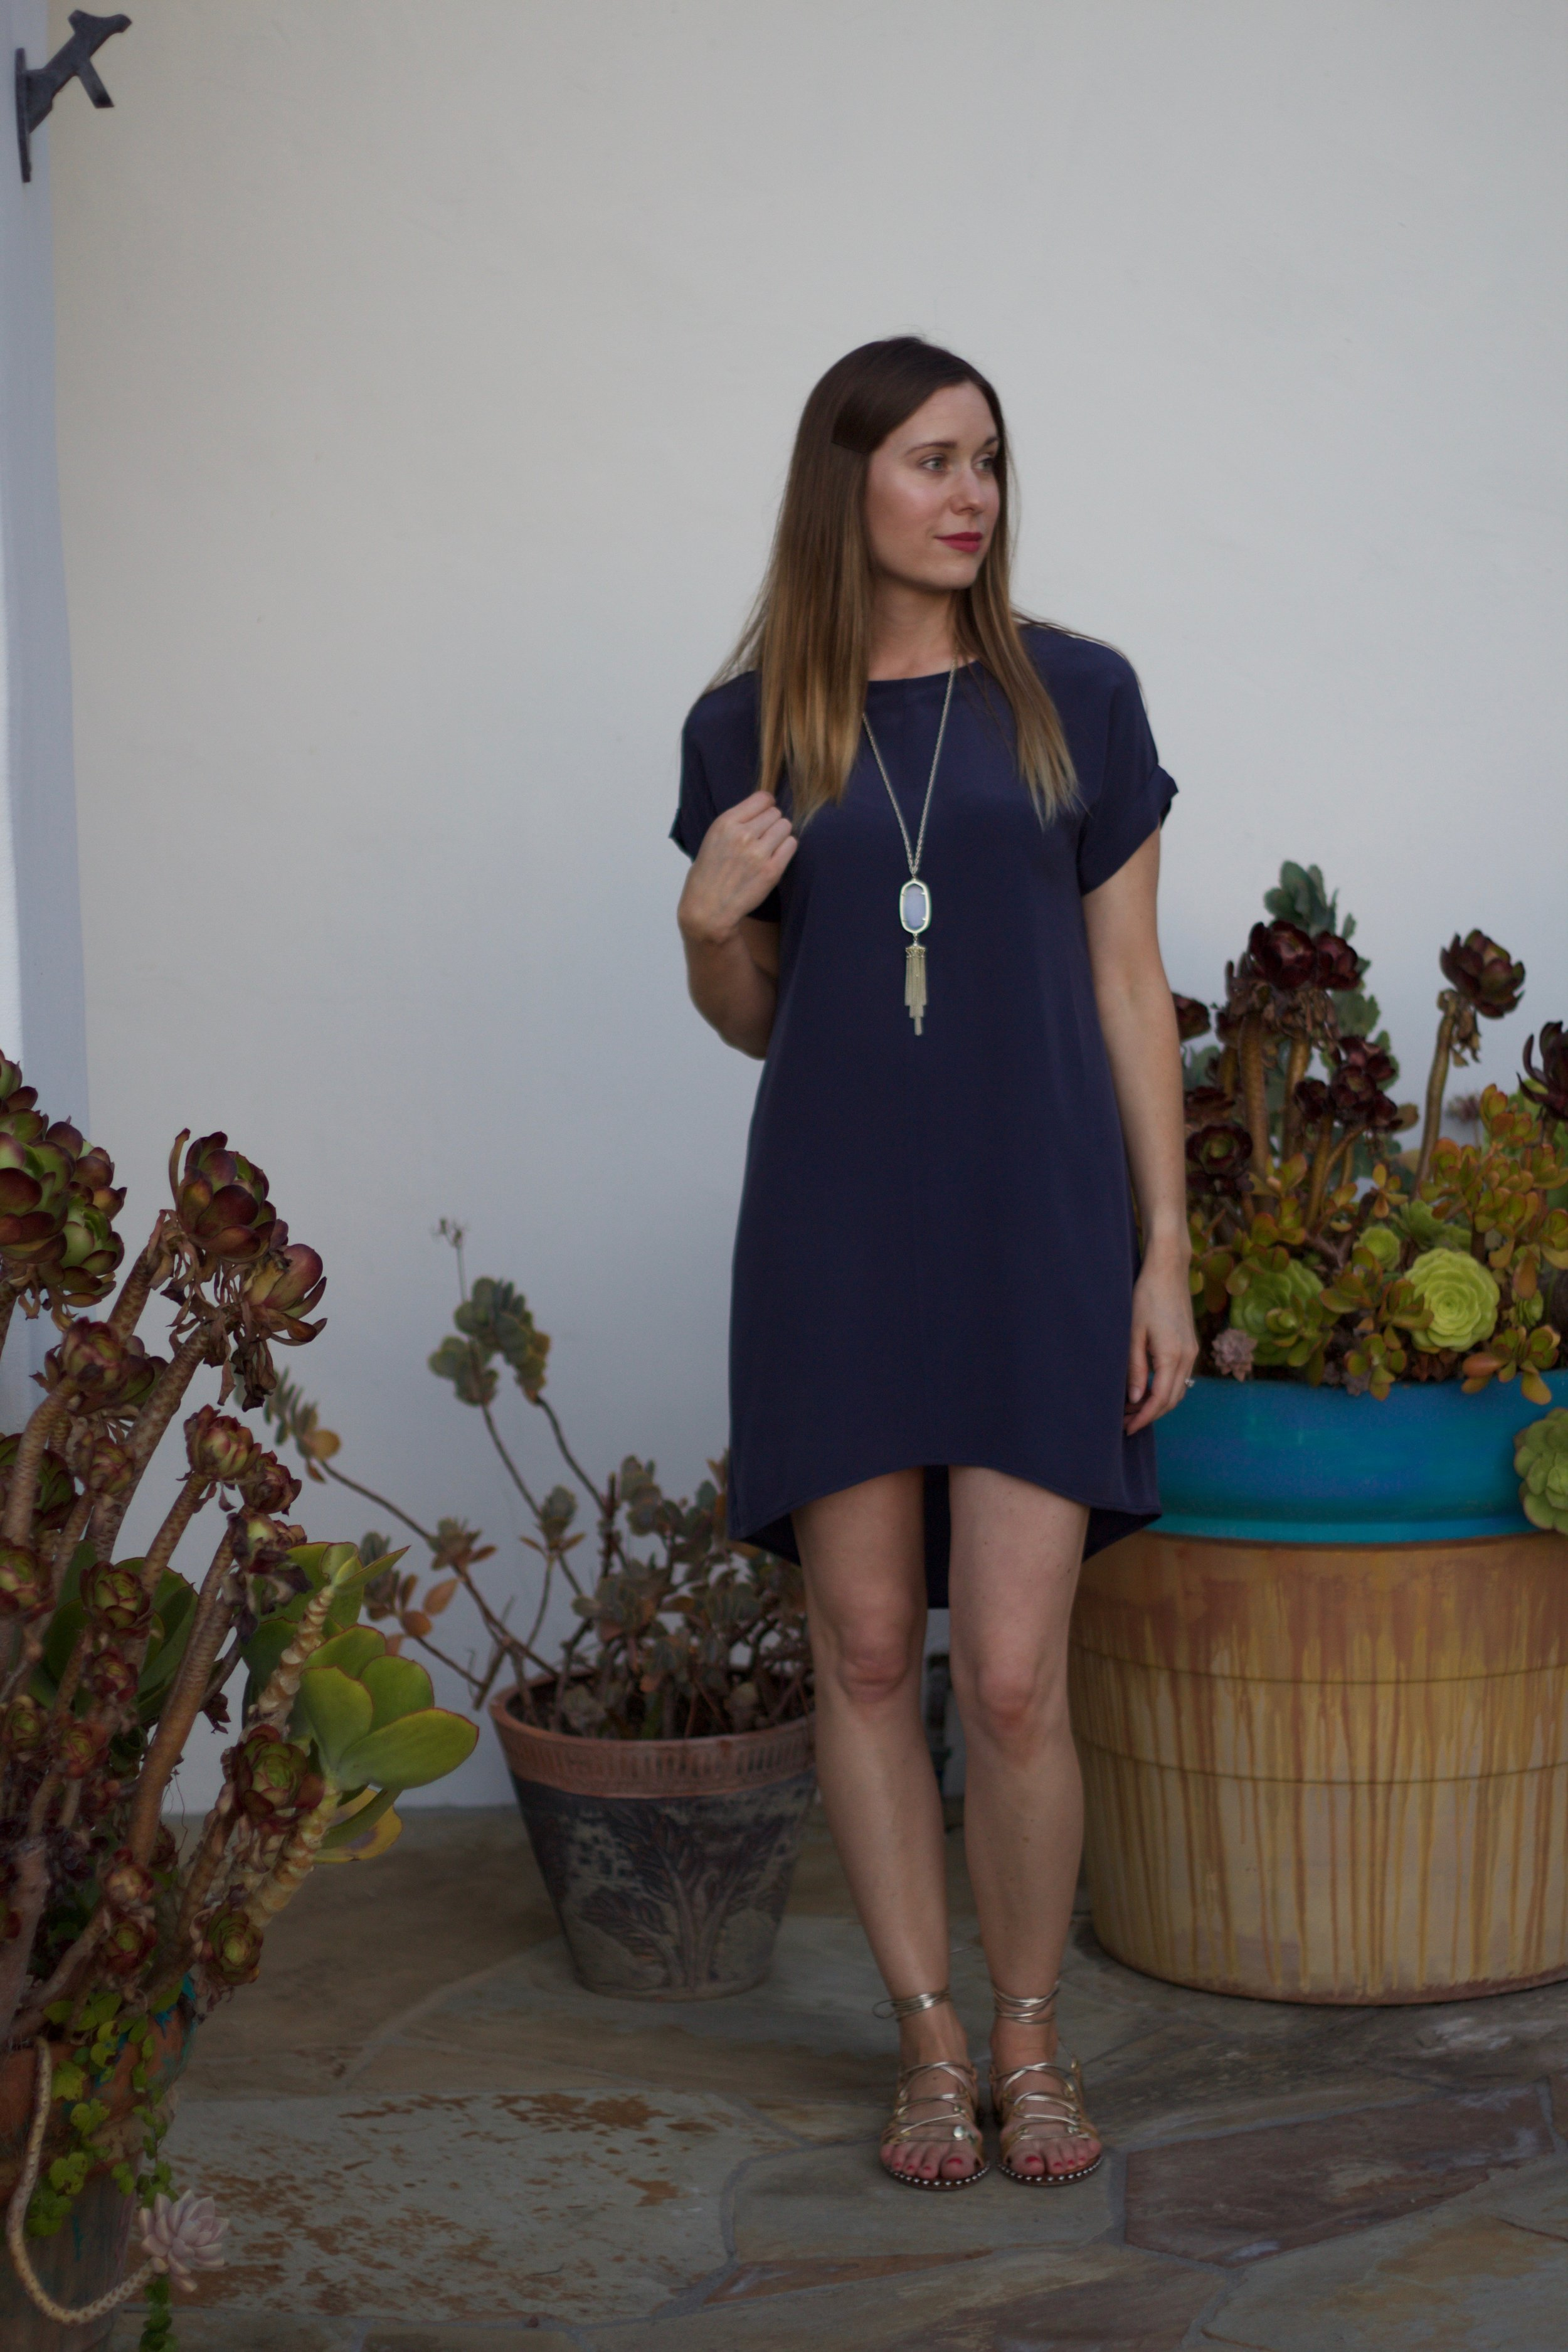 Everlane, t-shirt dress, navy blue dress, blue dress, kendra scott tassel necklace, tassel necklace, statement necklace